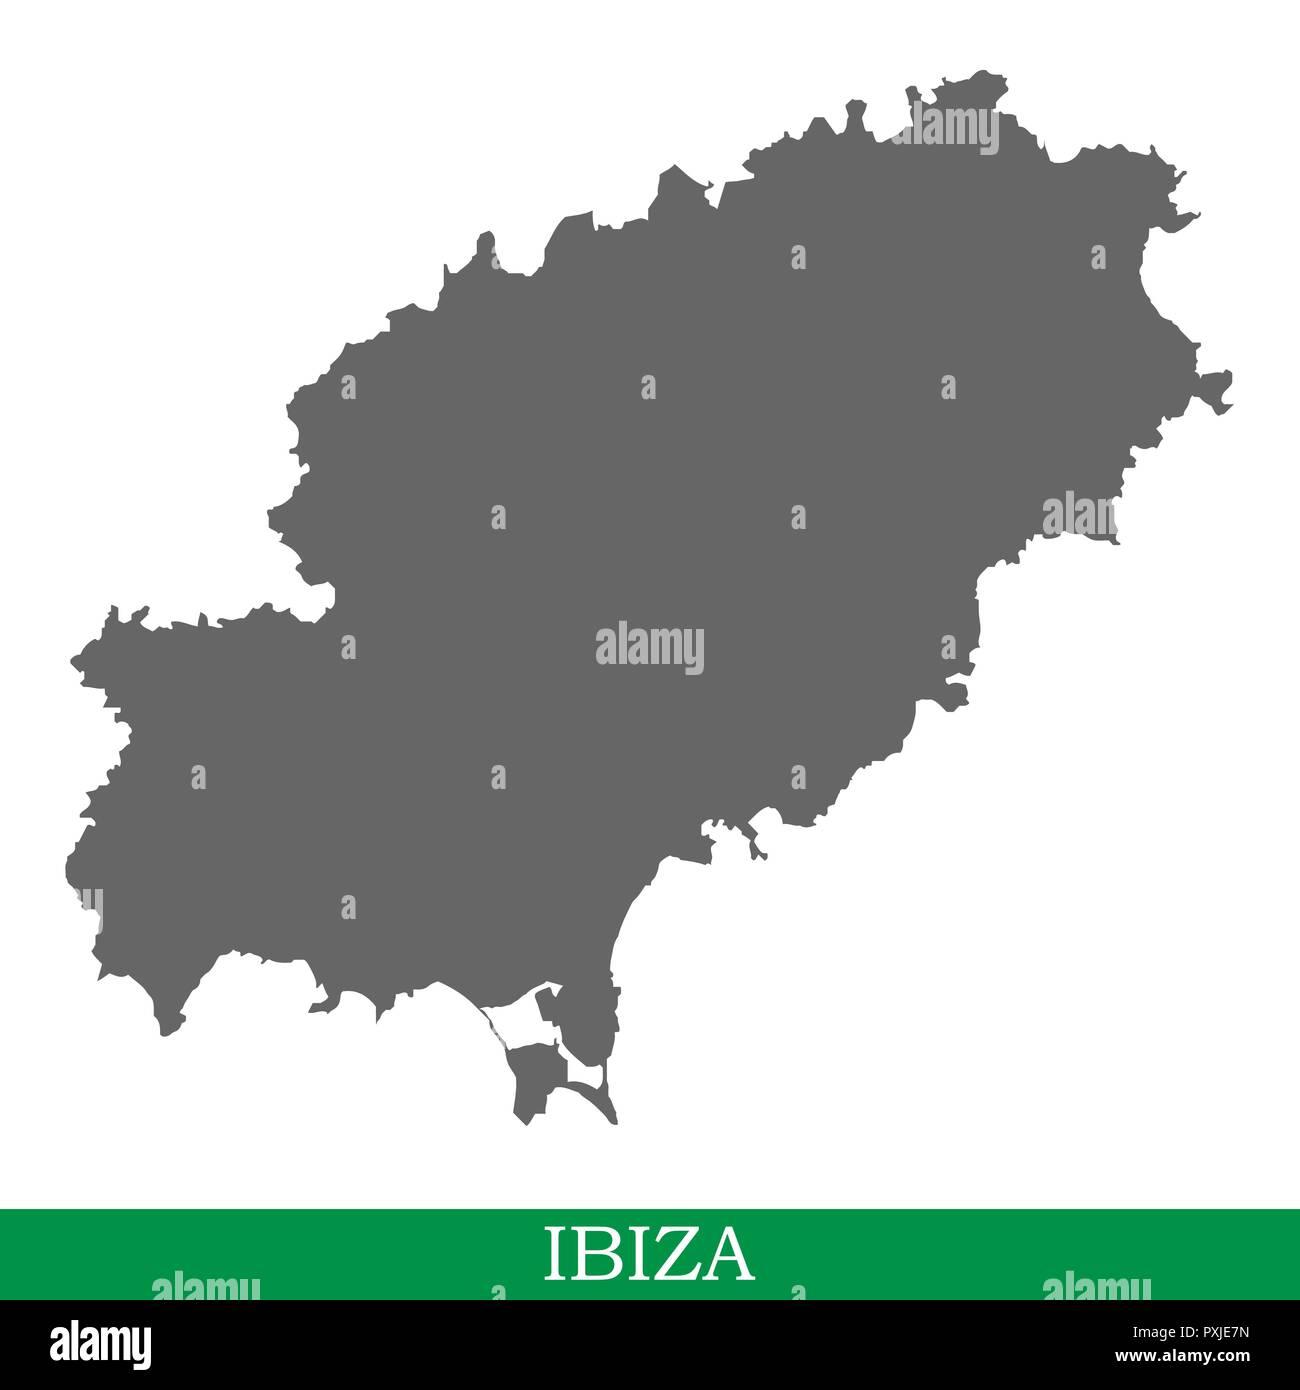 Ibiza Karte Ausdrucken.Ibiza Map Stockfotos Ibiza Map Bilder Alamy